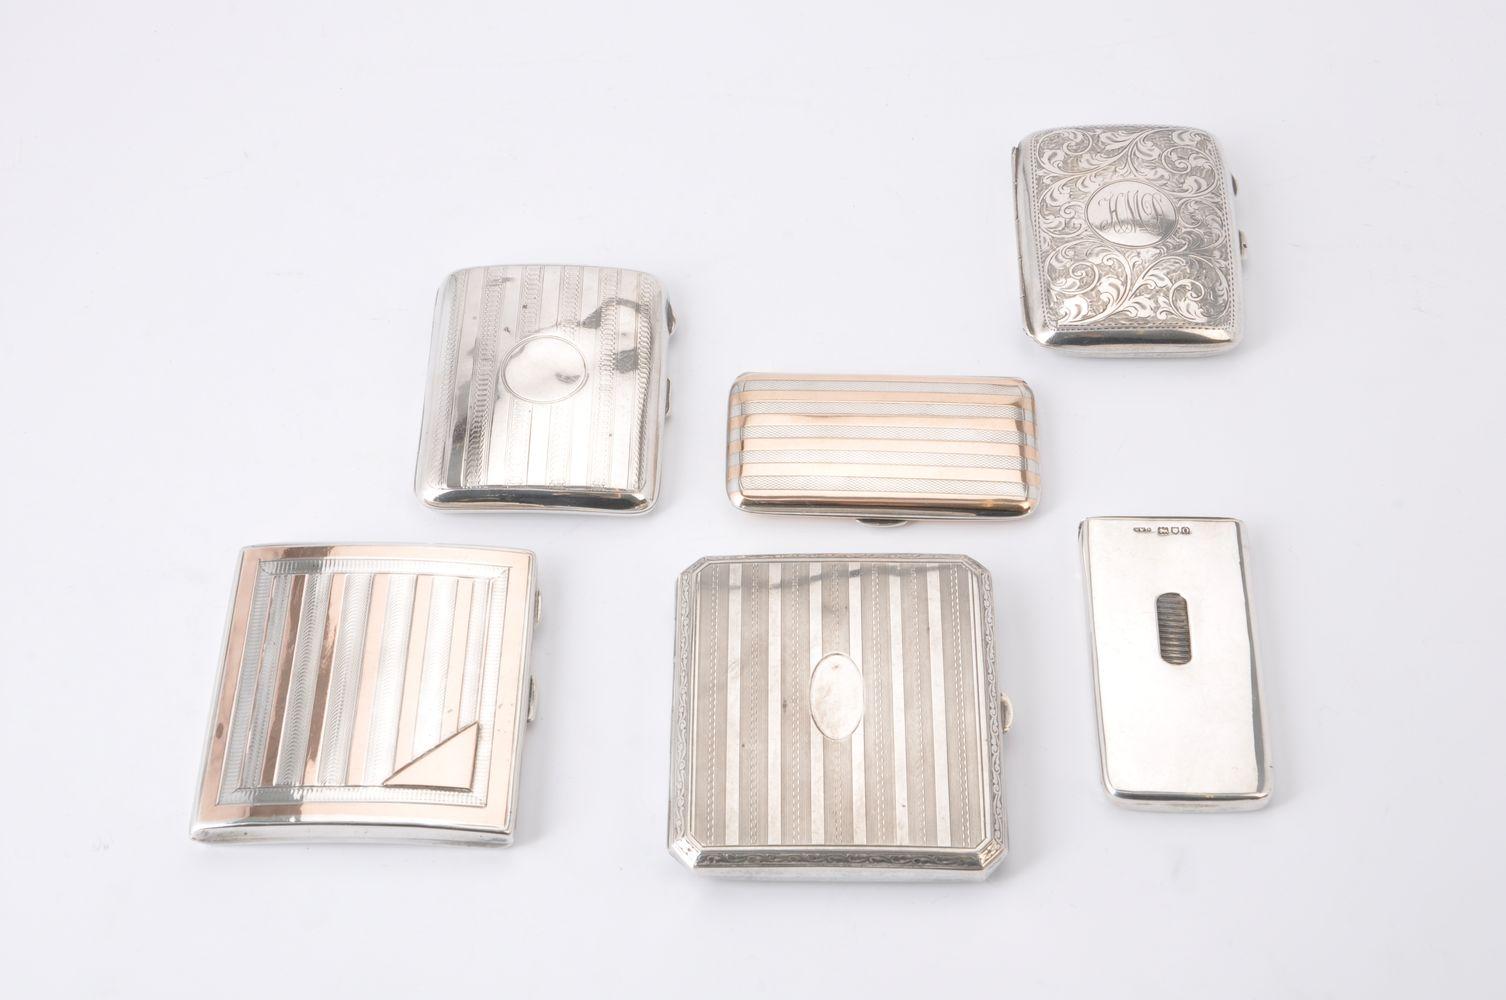 An Edwardian silver Needham's Patent rectangular card case by Henry Williamson Ltd